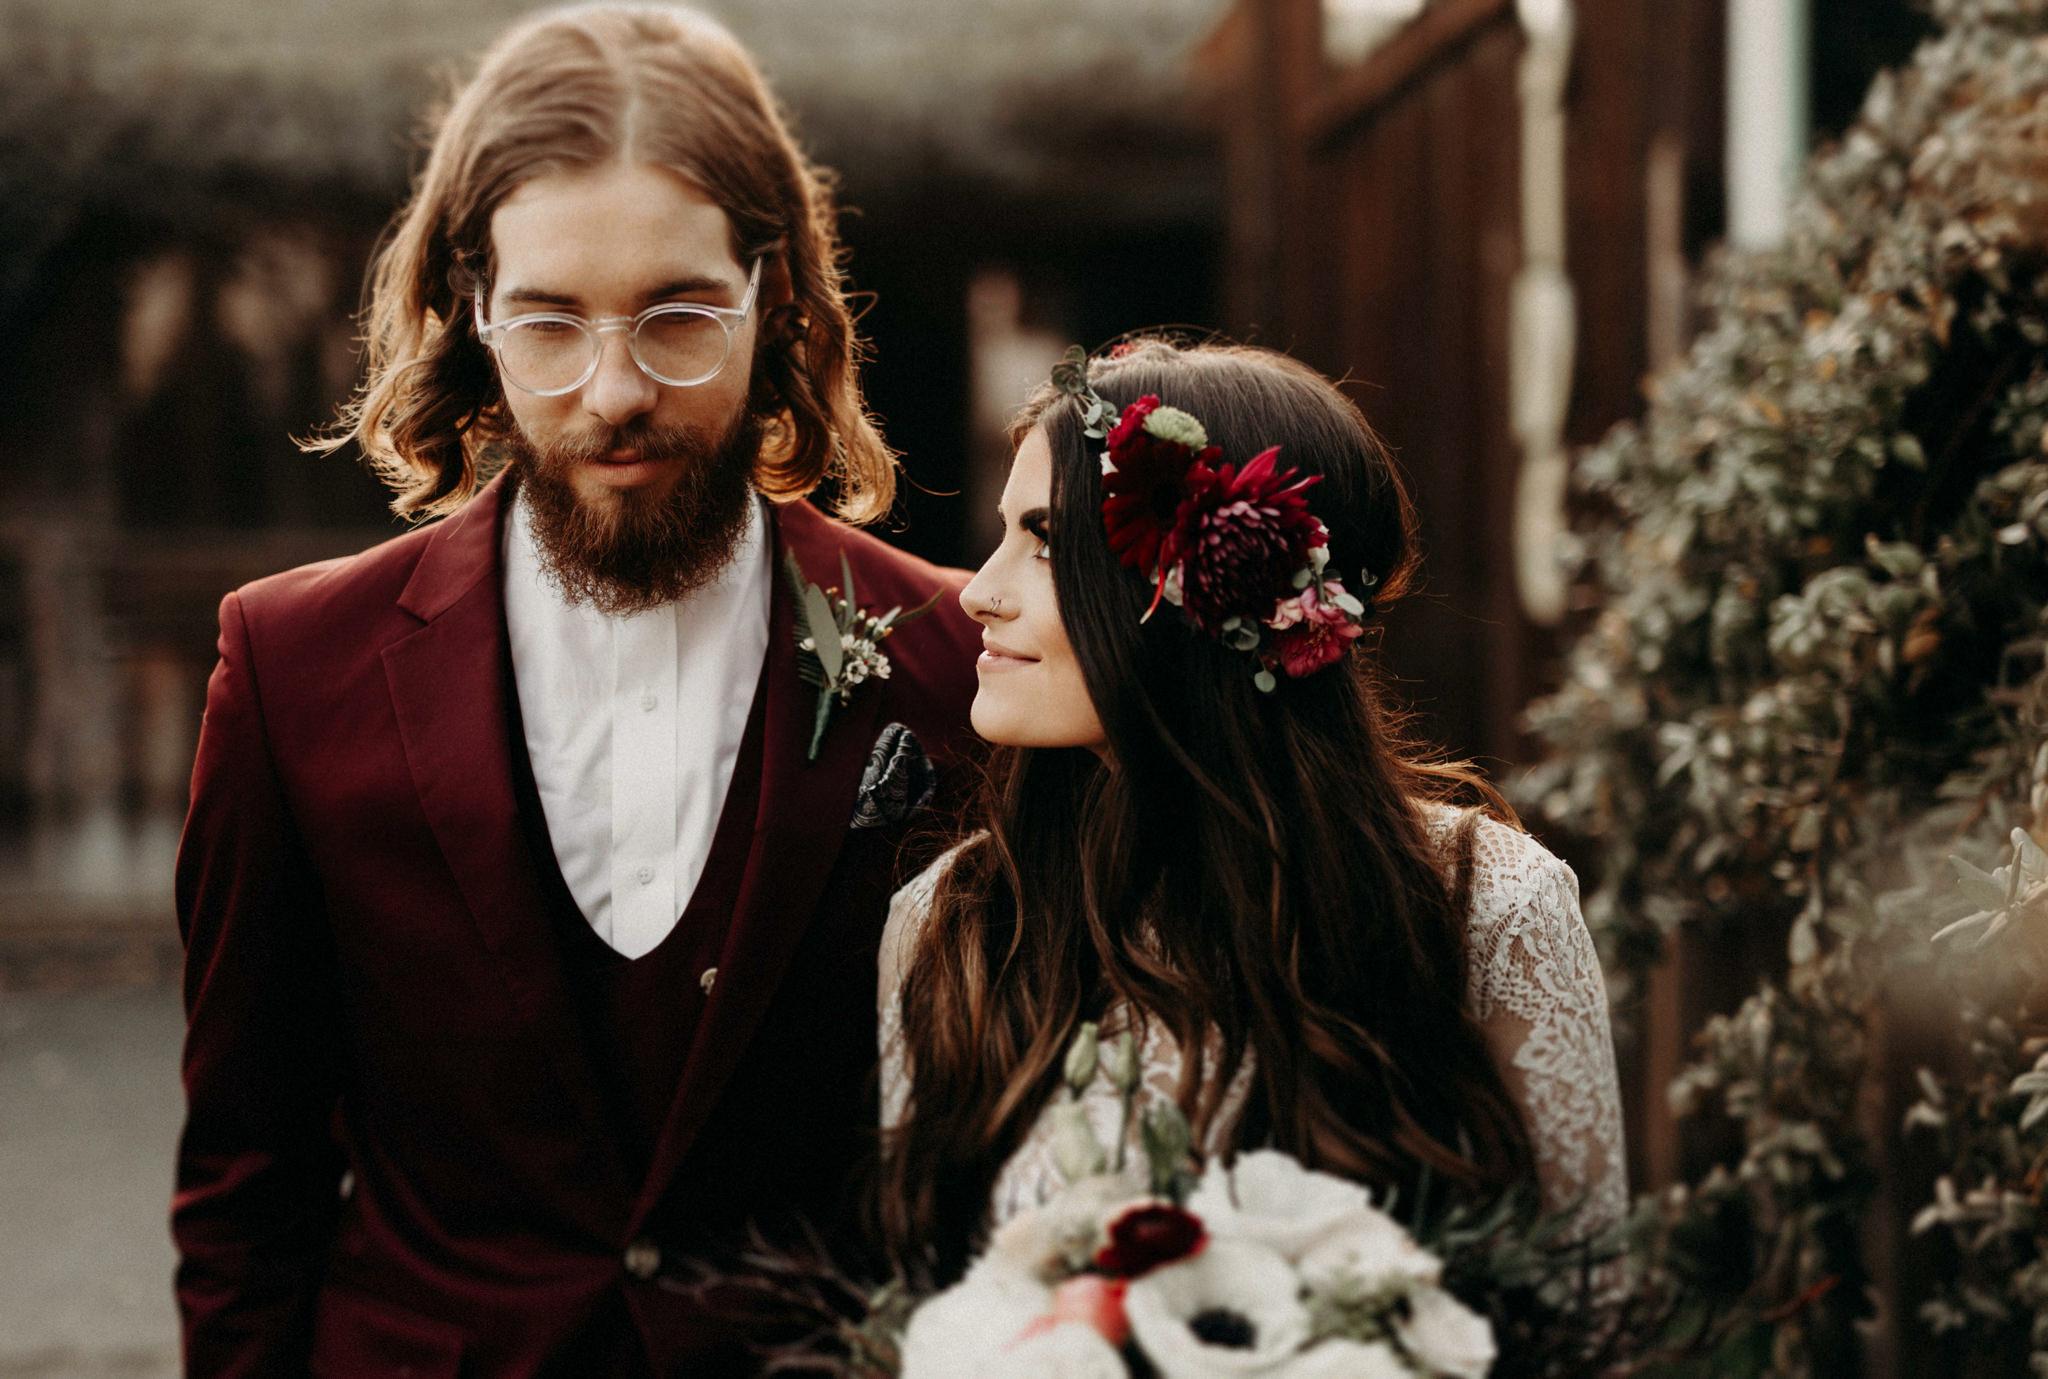 couple-wedding-indie-wedding-northern-california-74.jpg